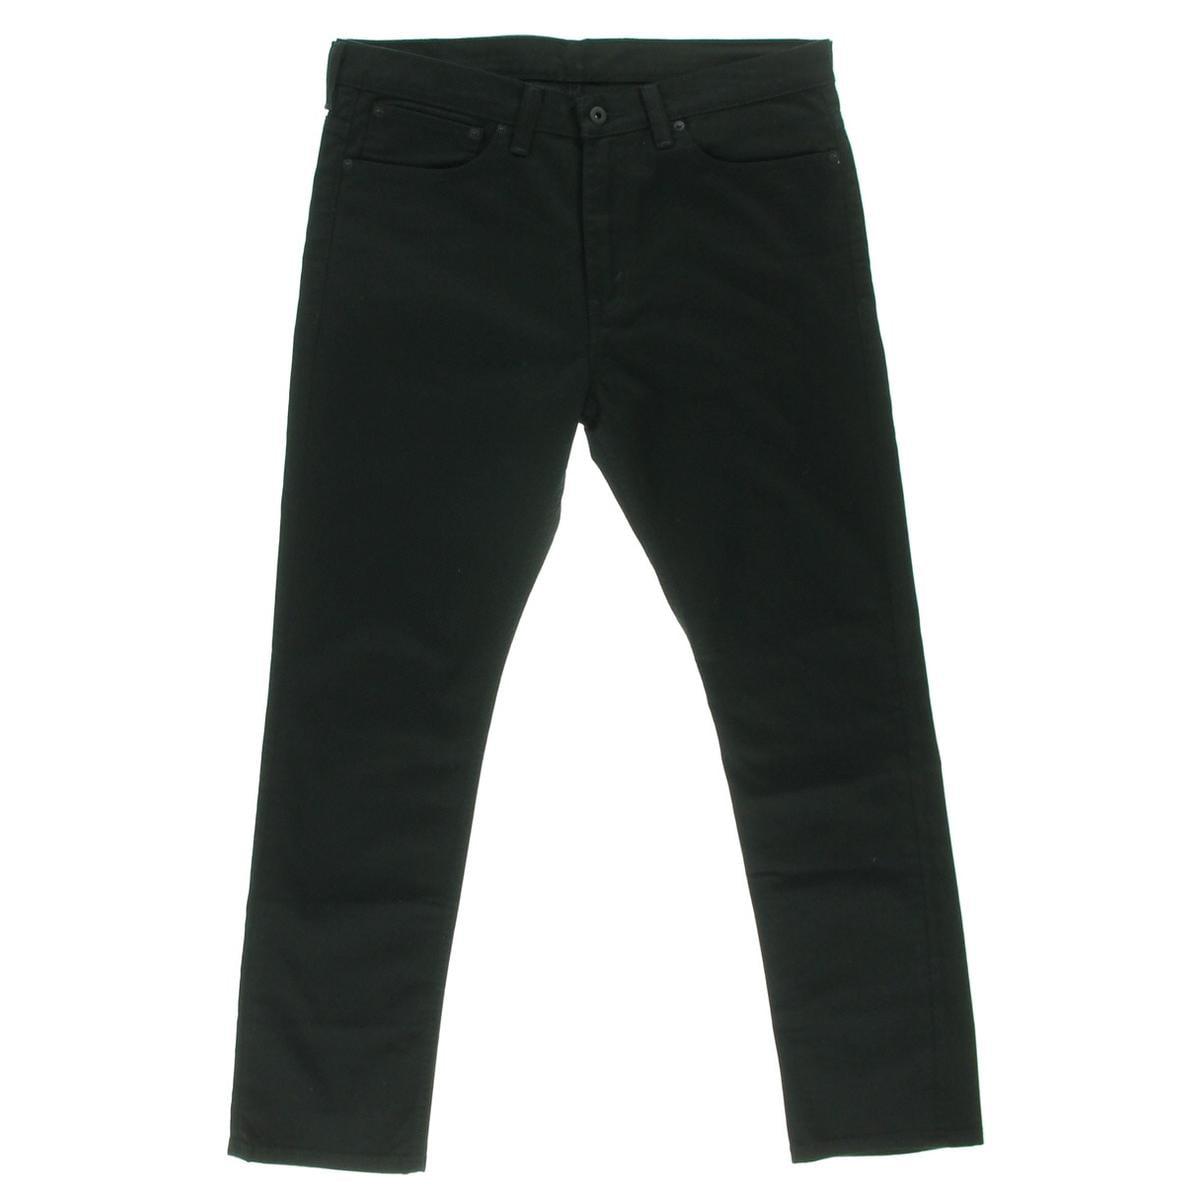 Levi's Mens 510 Denim Classic Rise Skinny Jeans